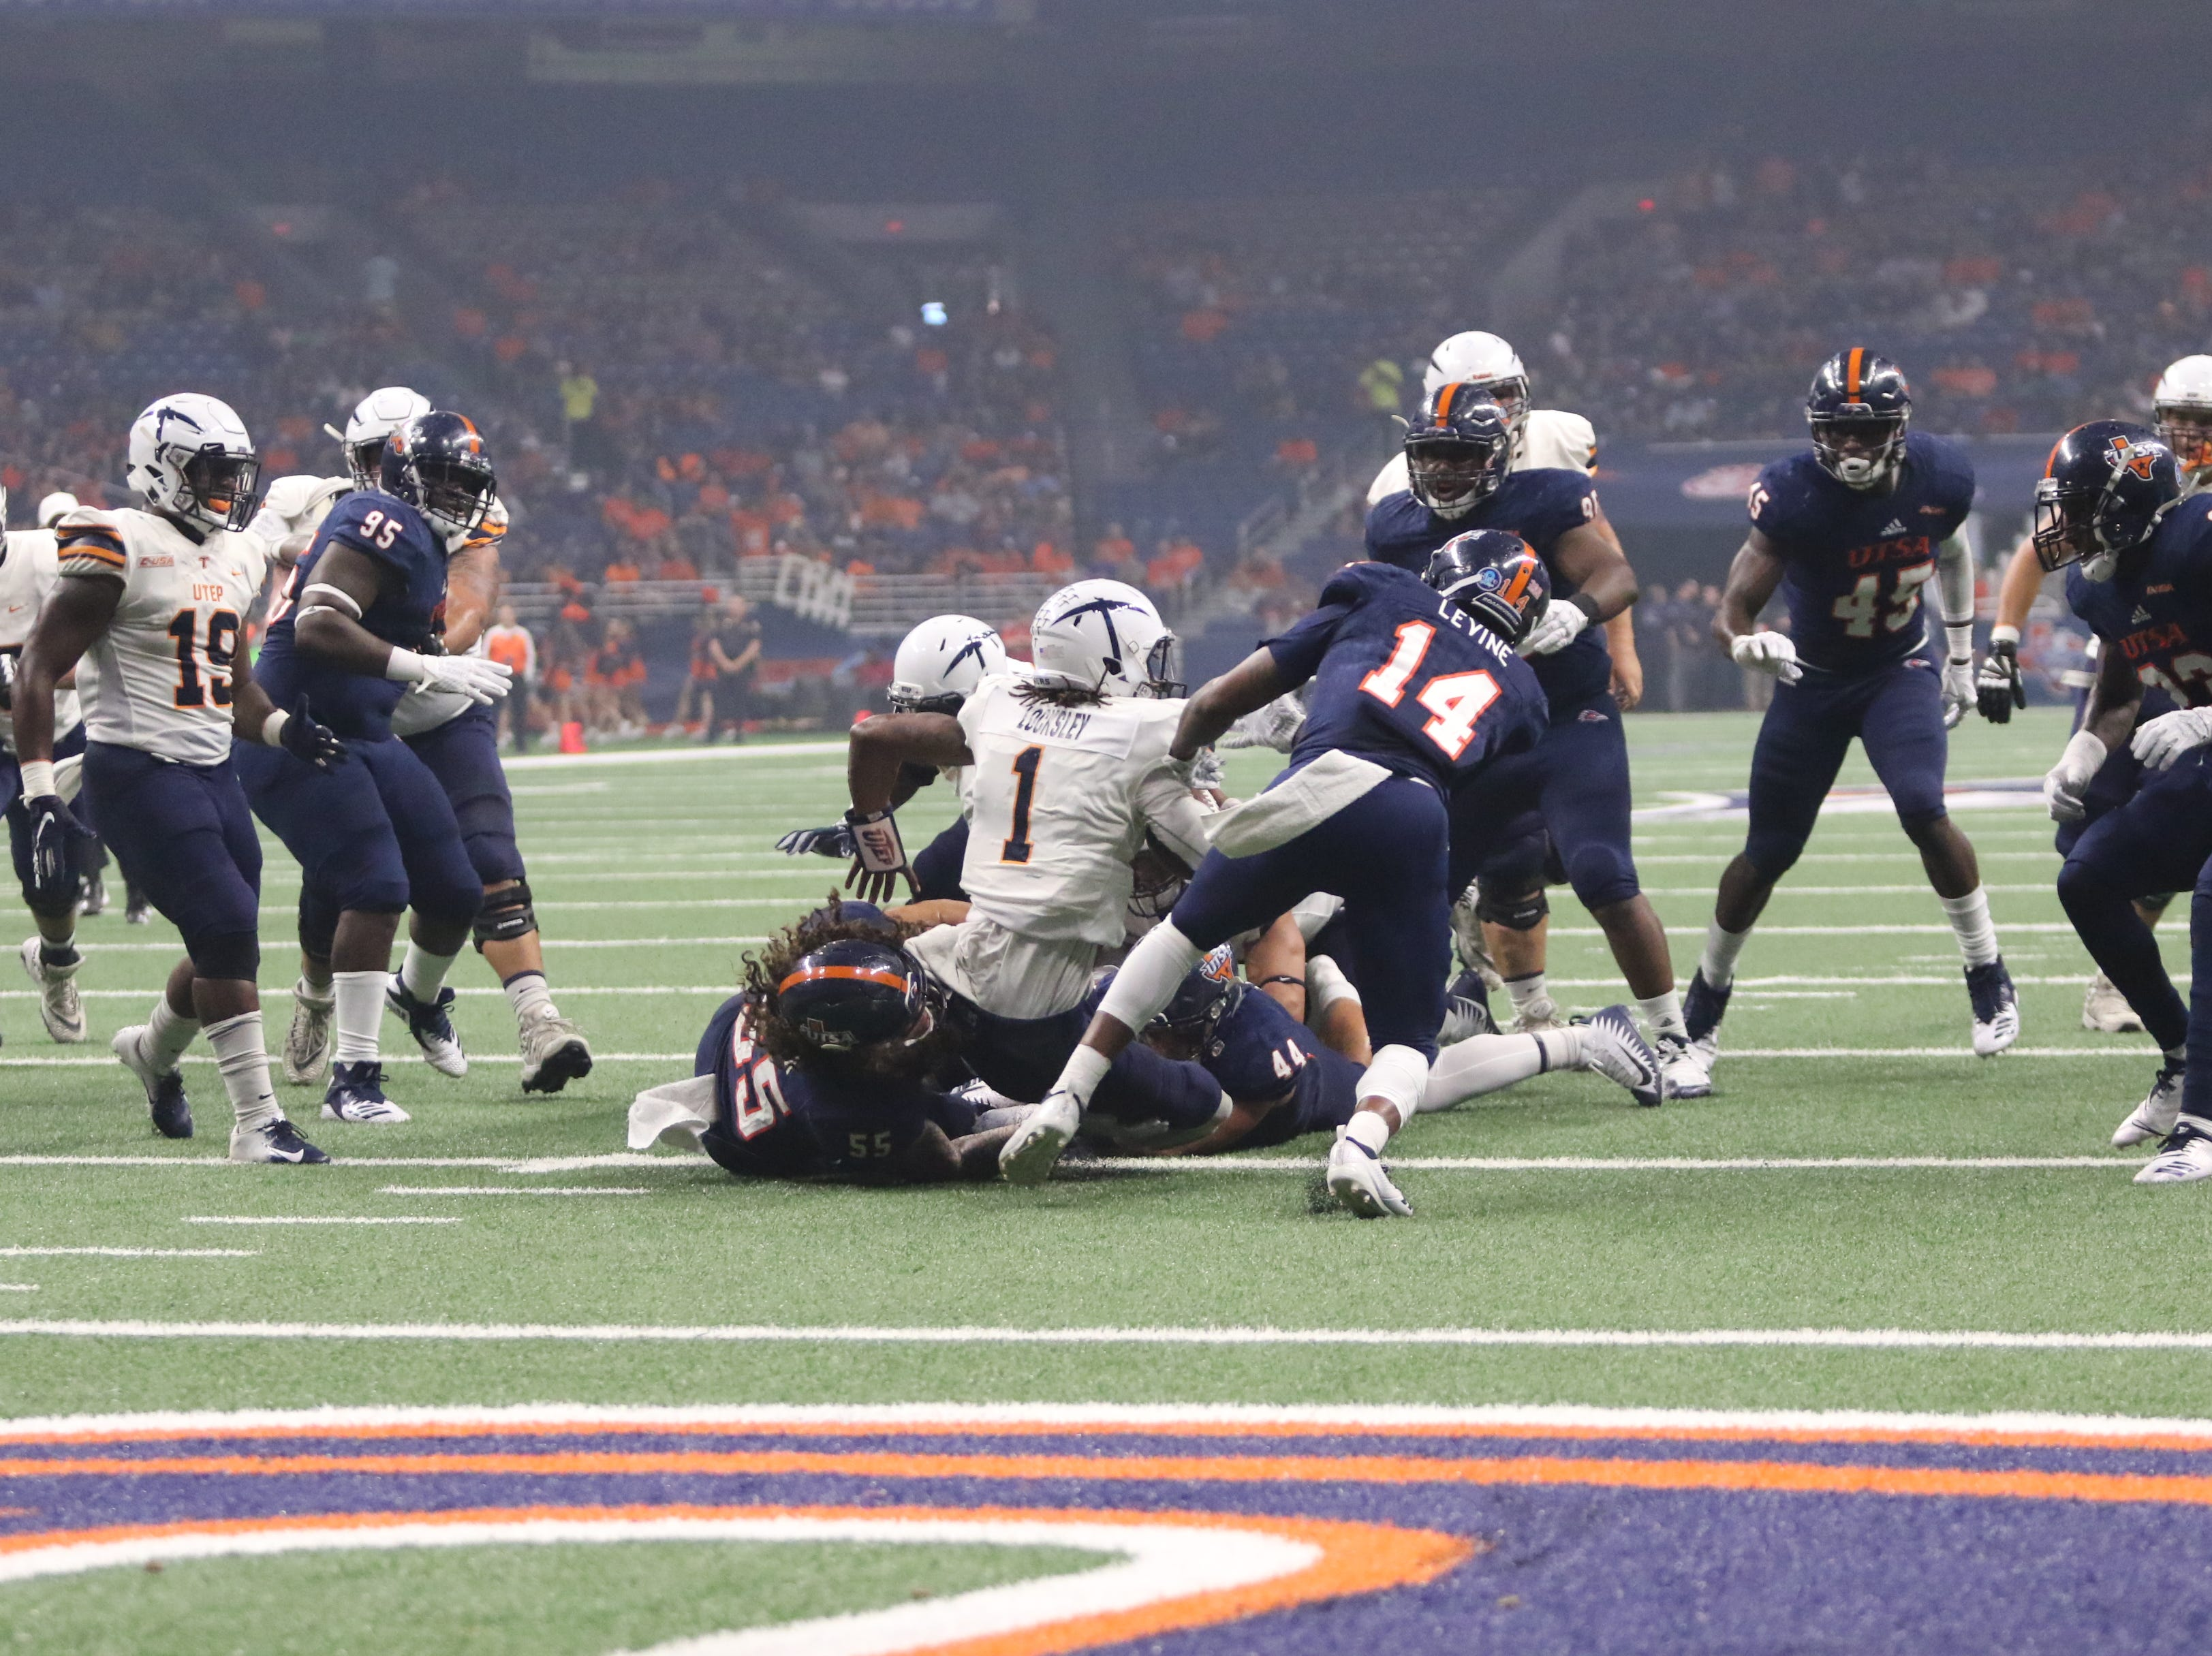 UTSA led UTEP 24-7 at the half of their football game in San Antonio, Texas.